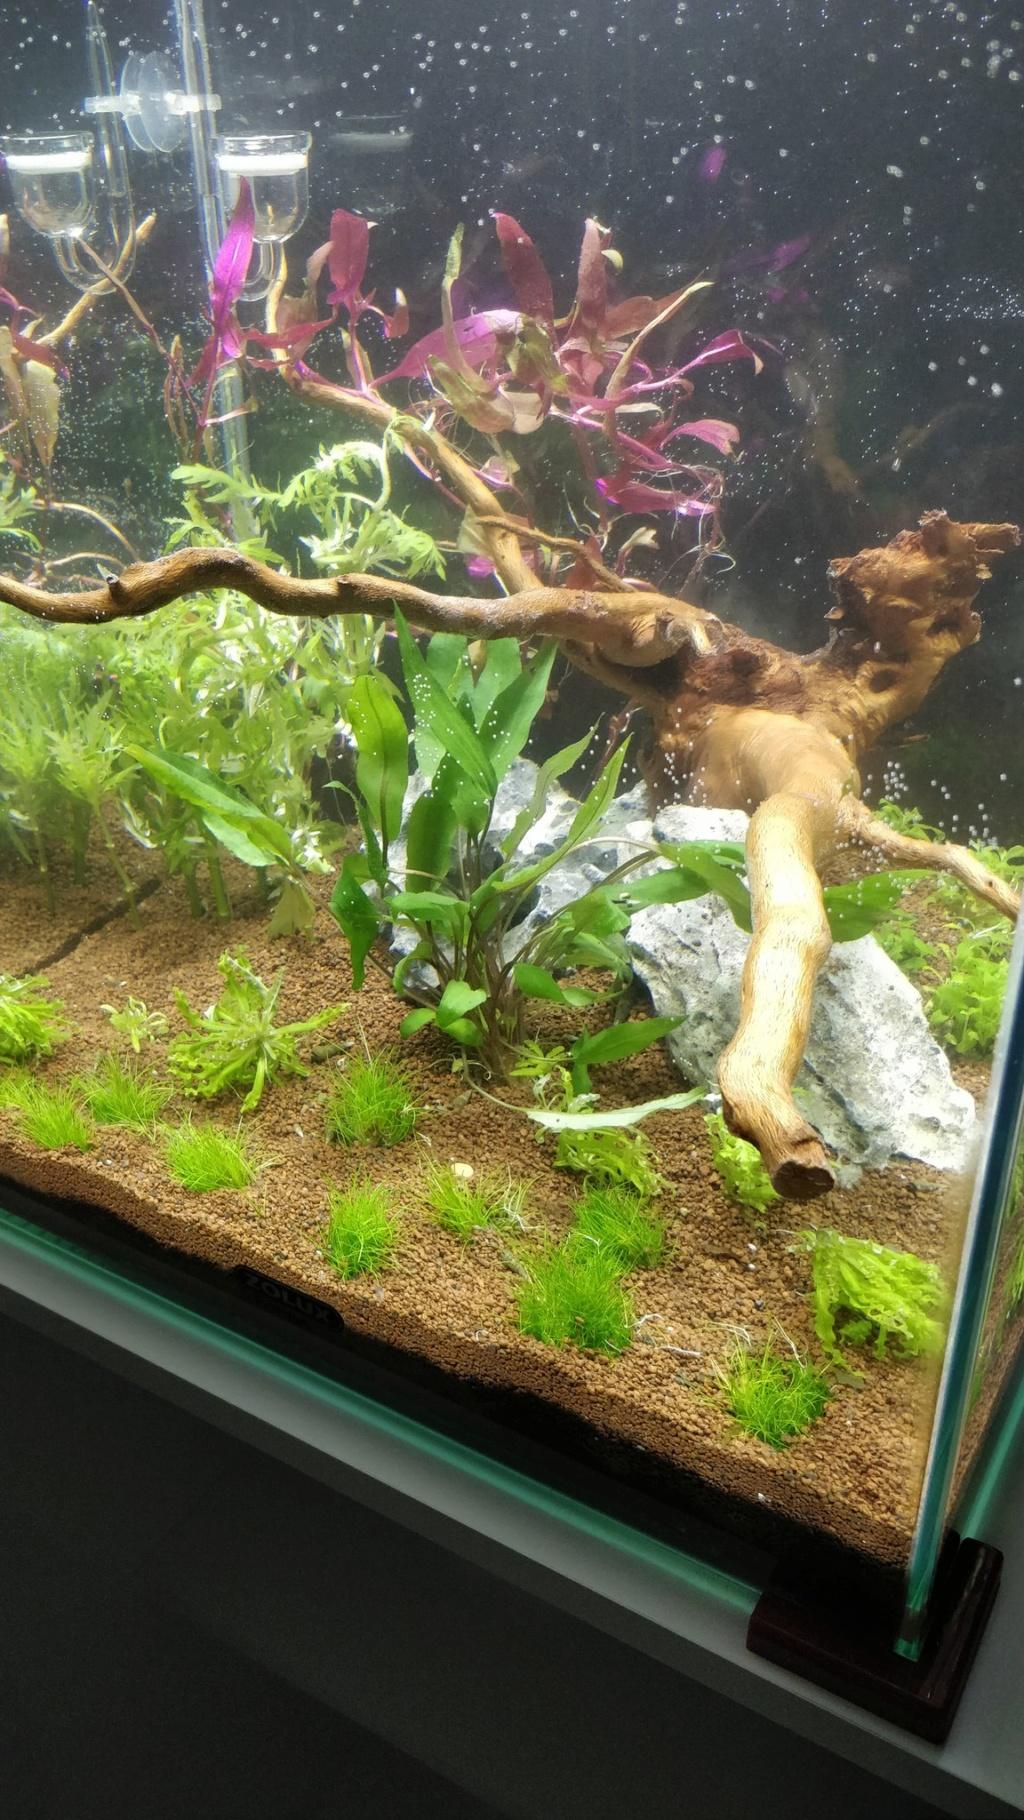 [2-Aquario] Bac 50L - Biotope Asiatique Qkz2lg10